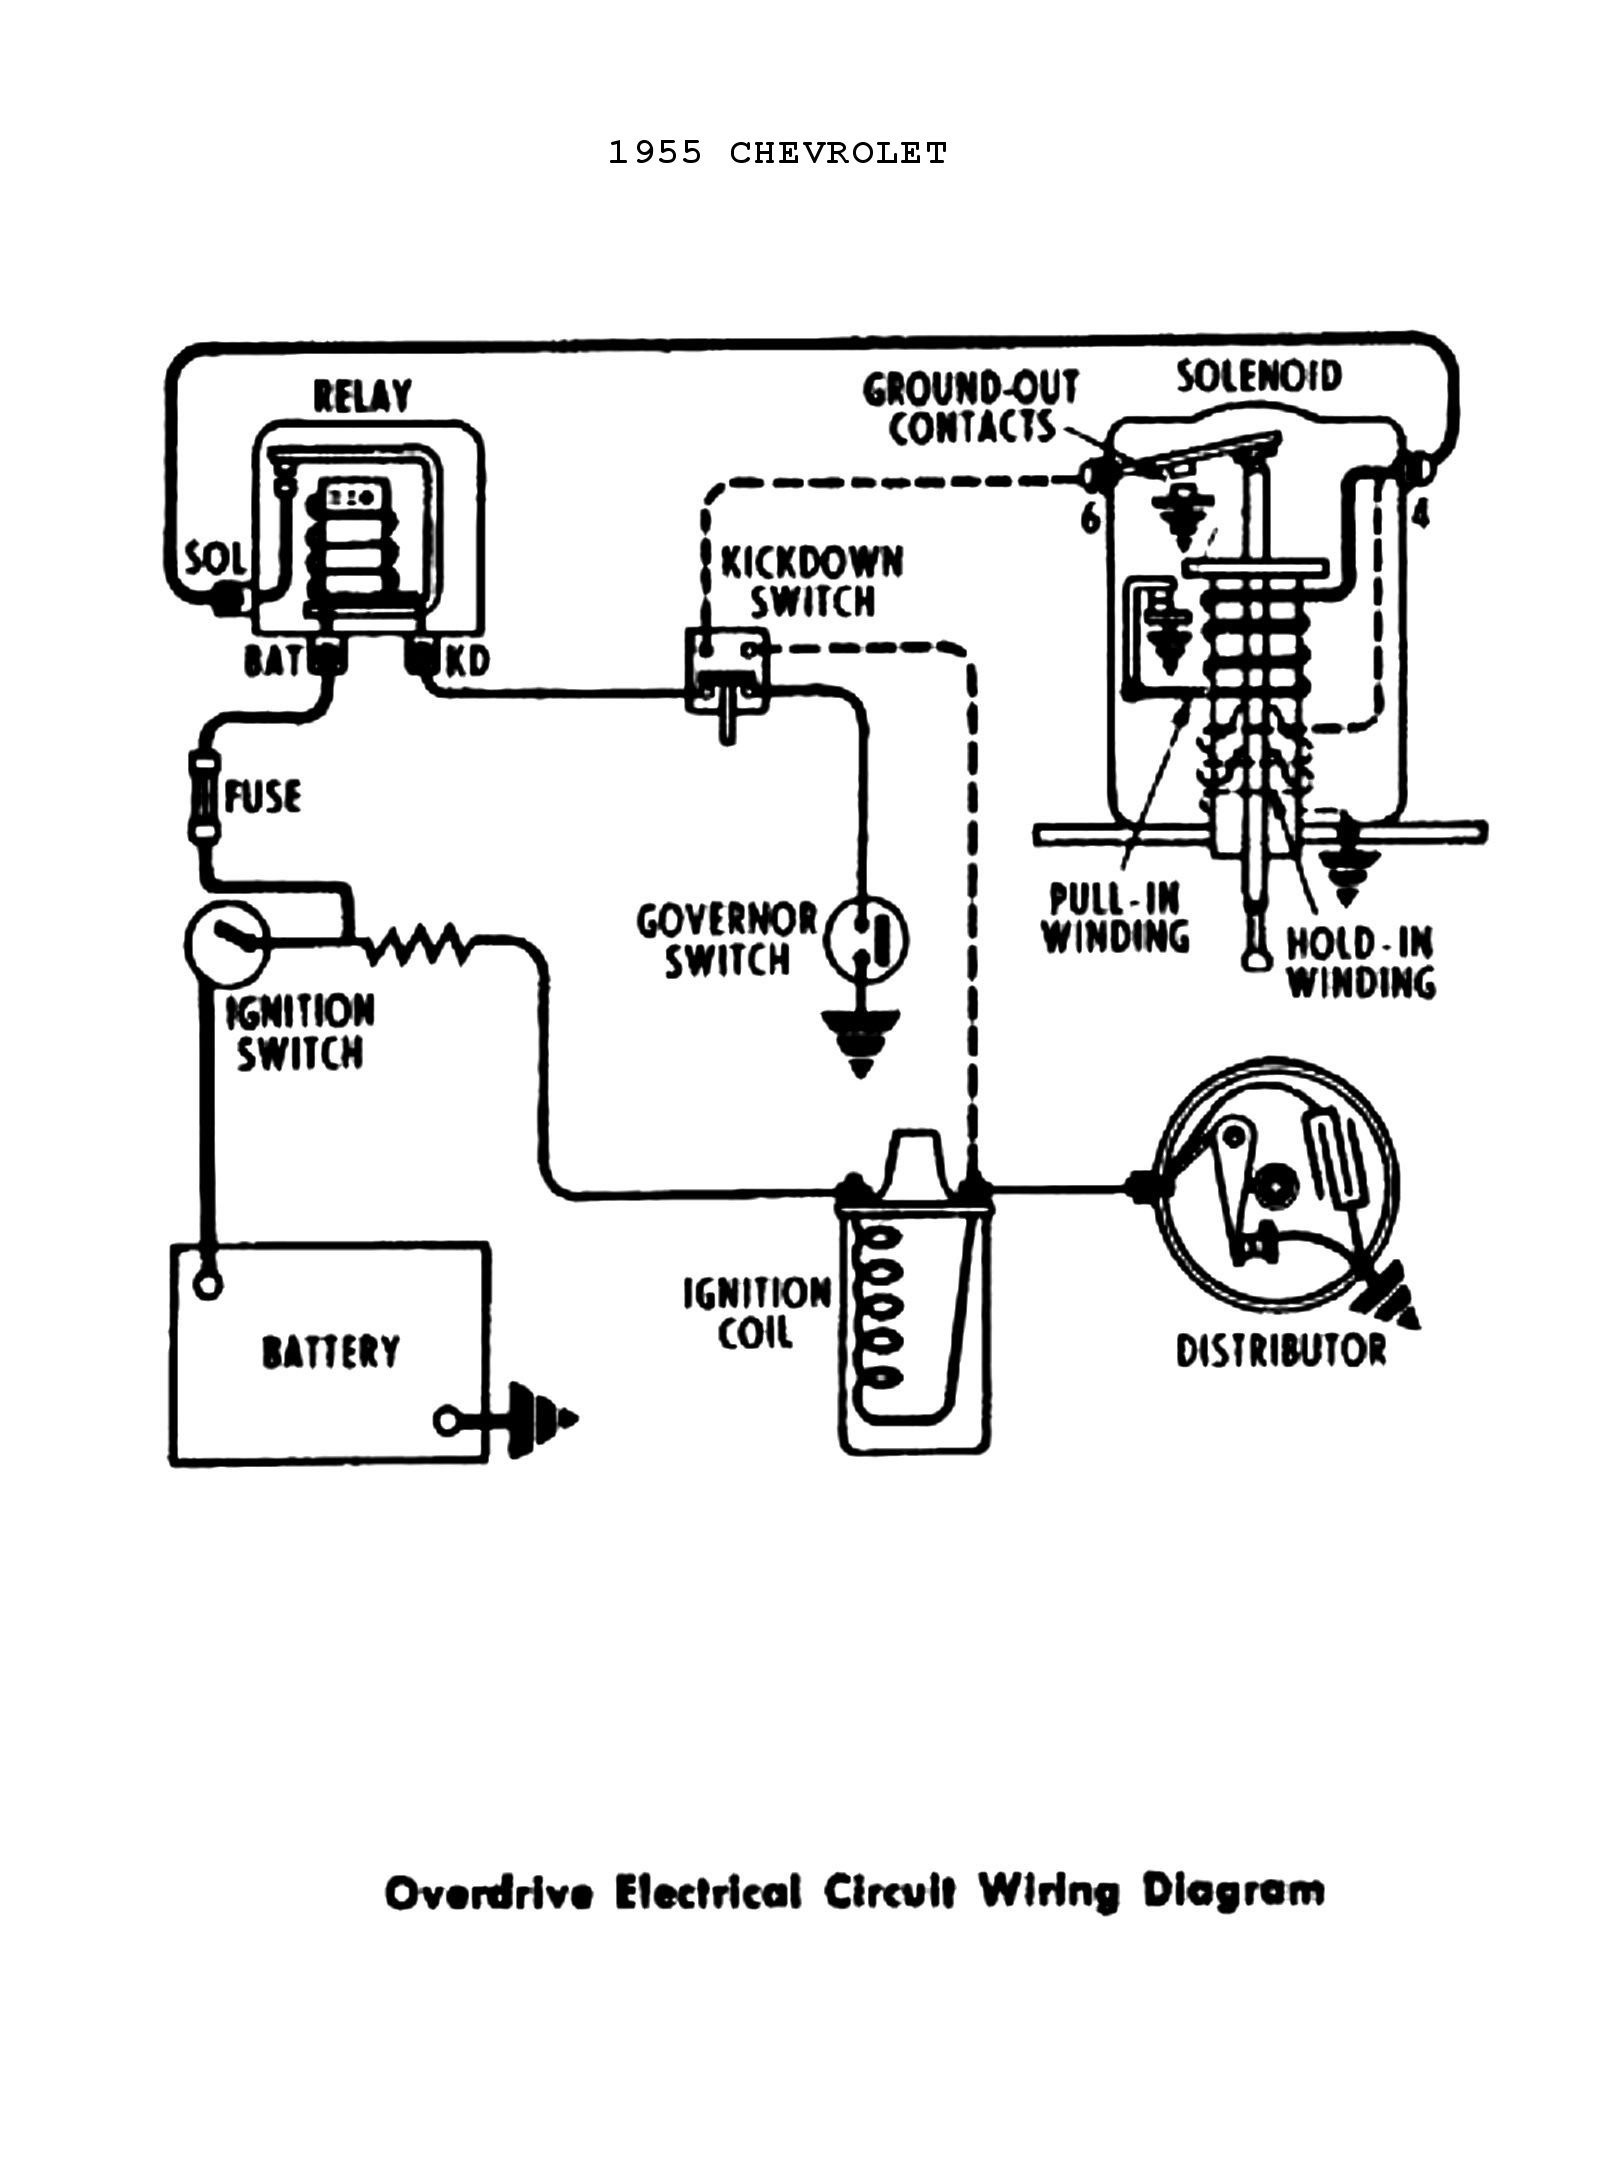 Viper 5706 Wiring Diagram